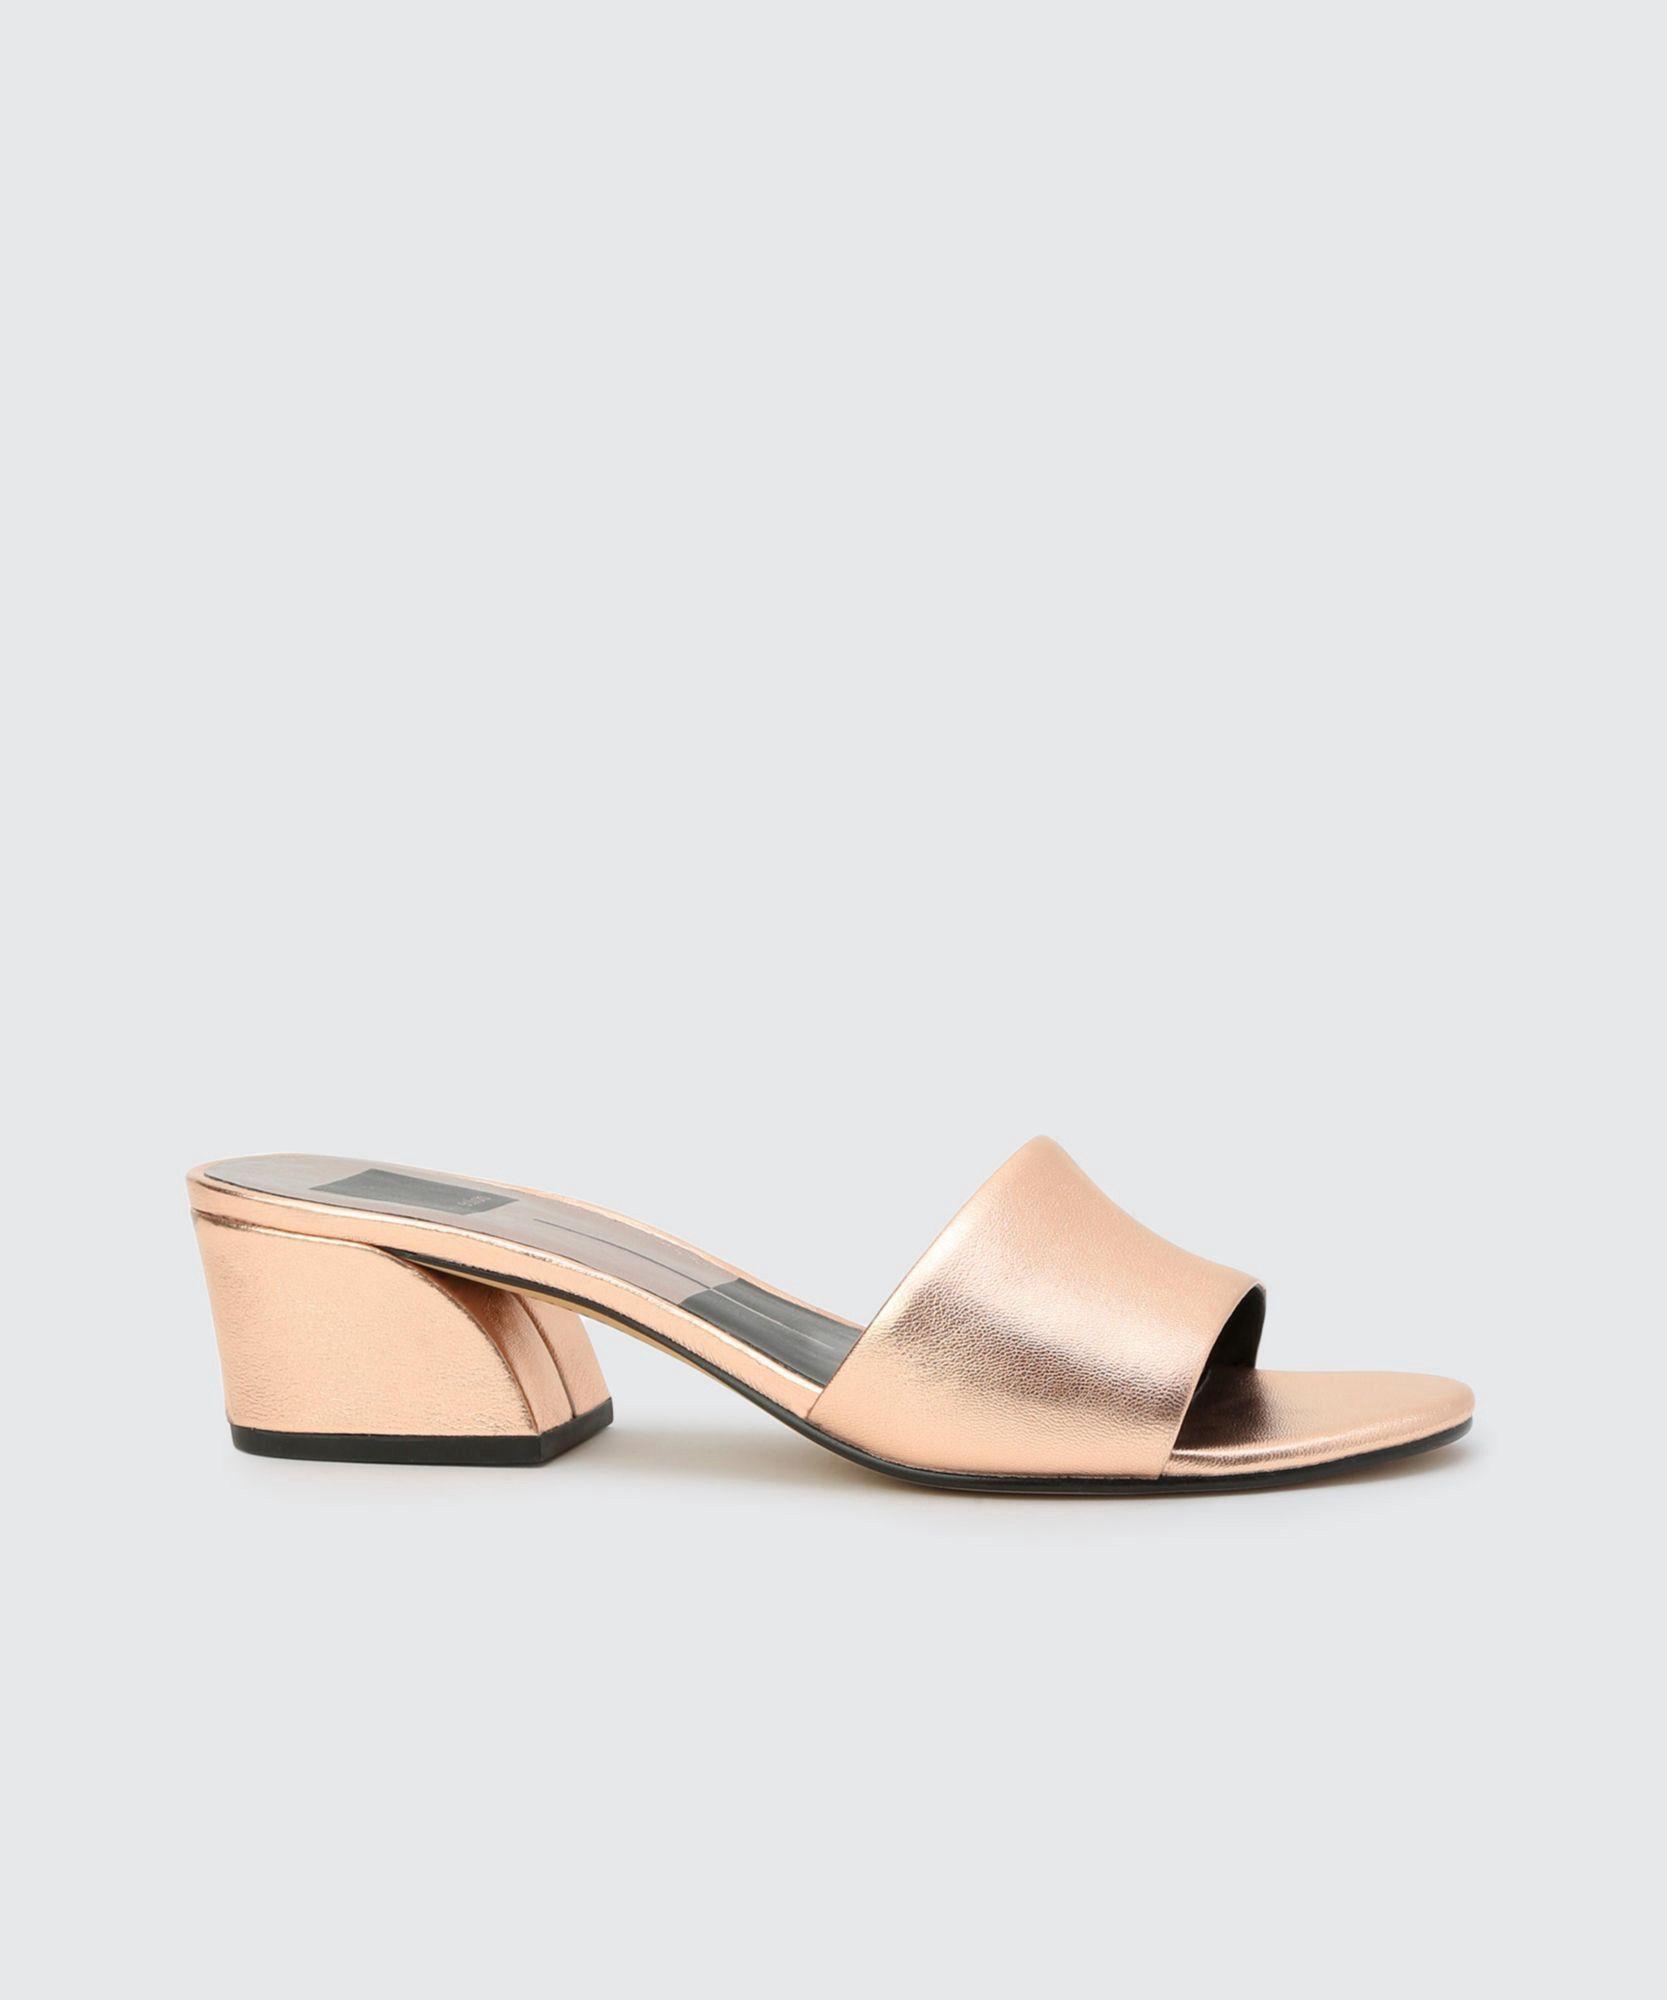 c54325db125ae DOLCE VITA RILEE HEELS.  dolcevita  shoes